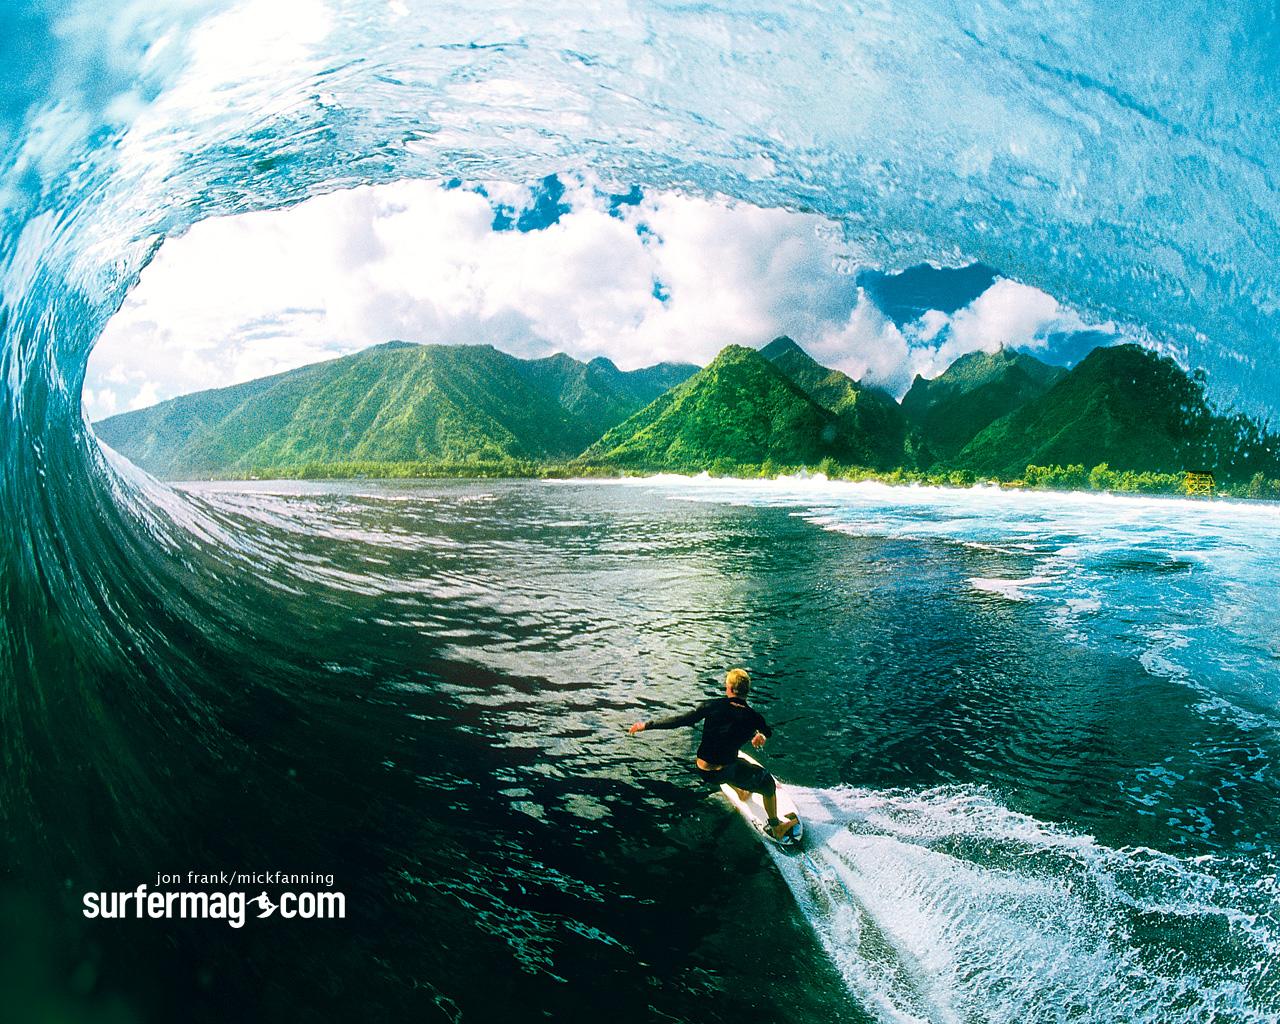 surfing (surfing.jpg) - 535778 - Free Image Hosting at TurboImageHost